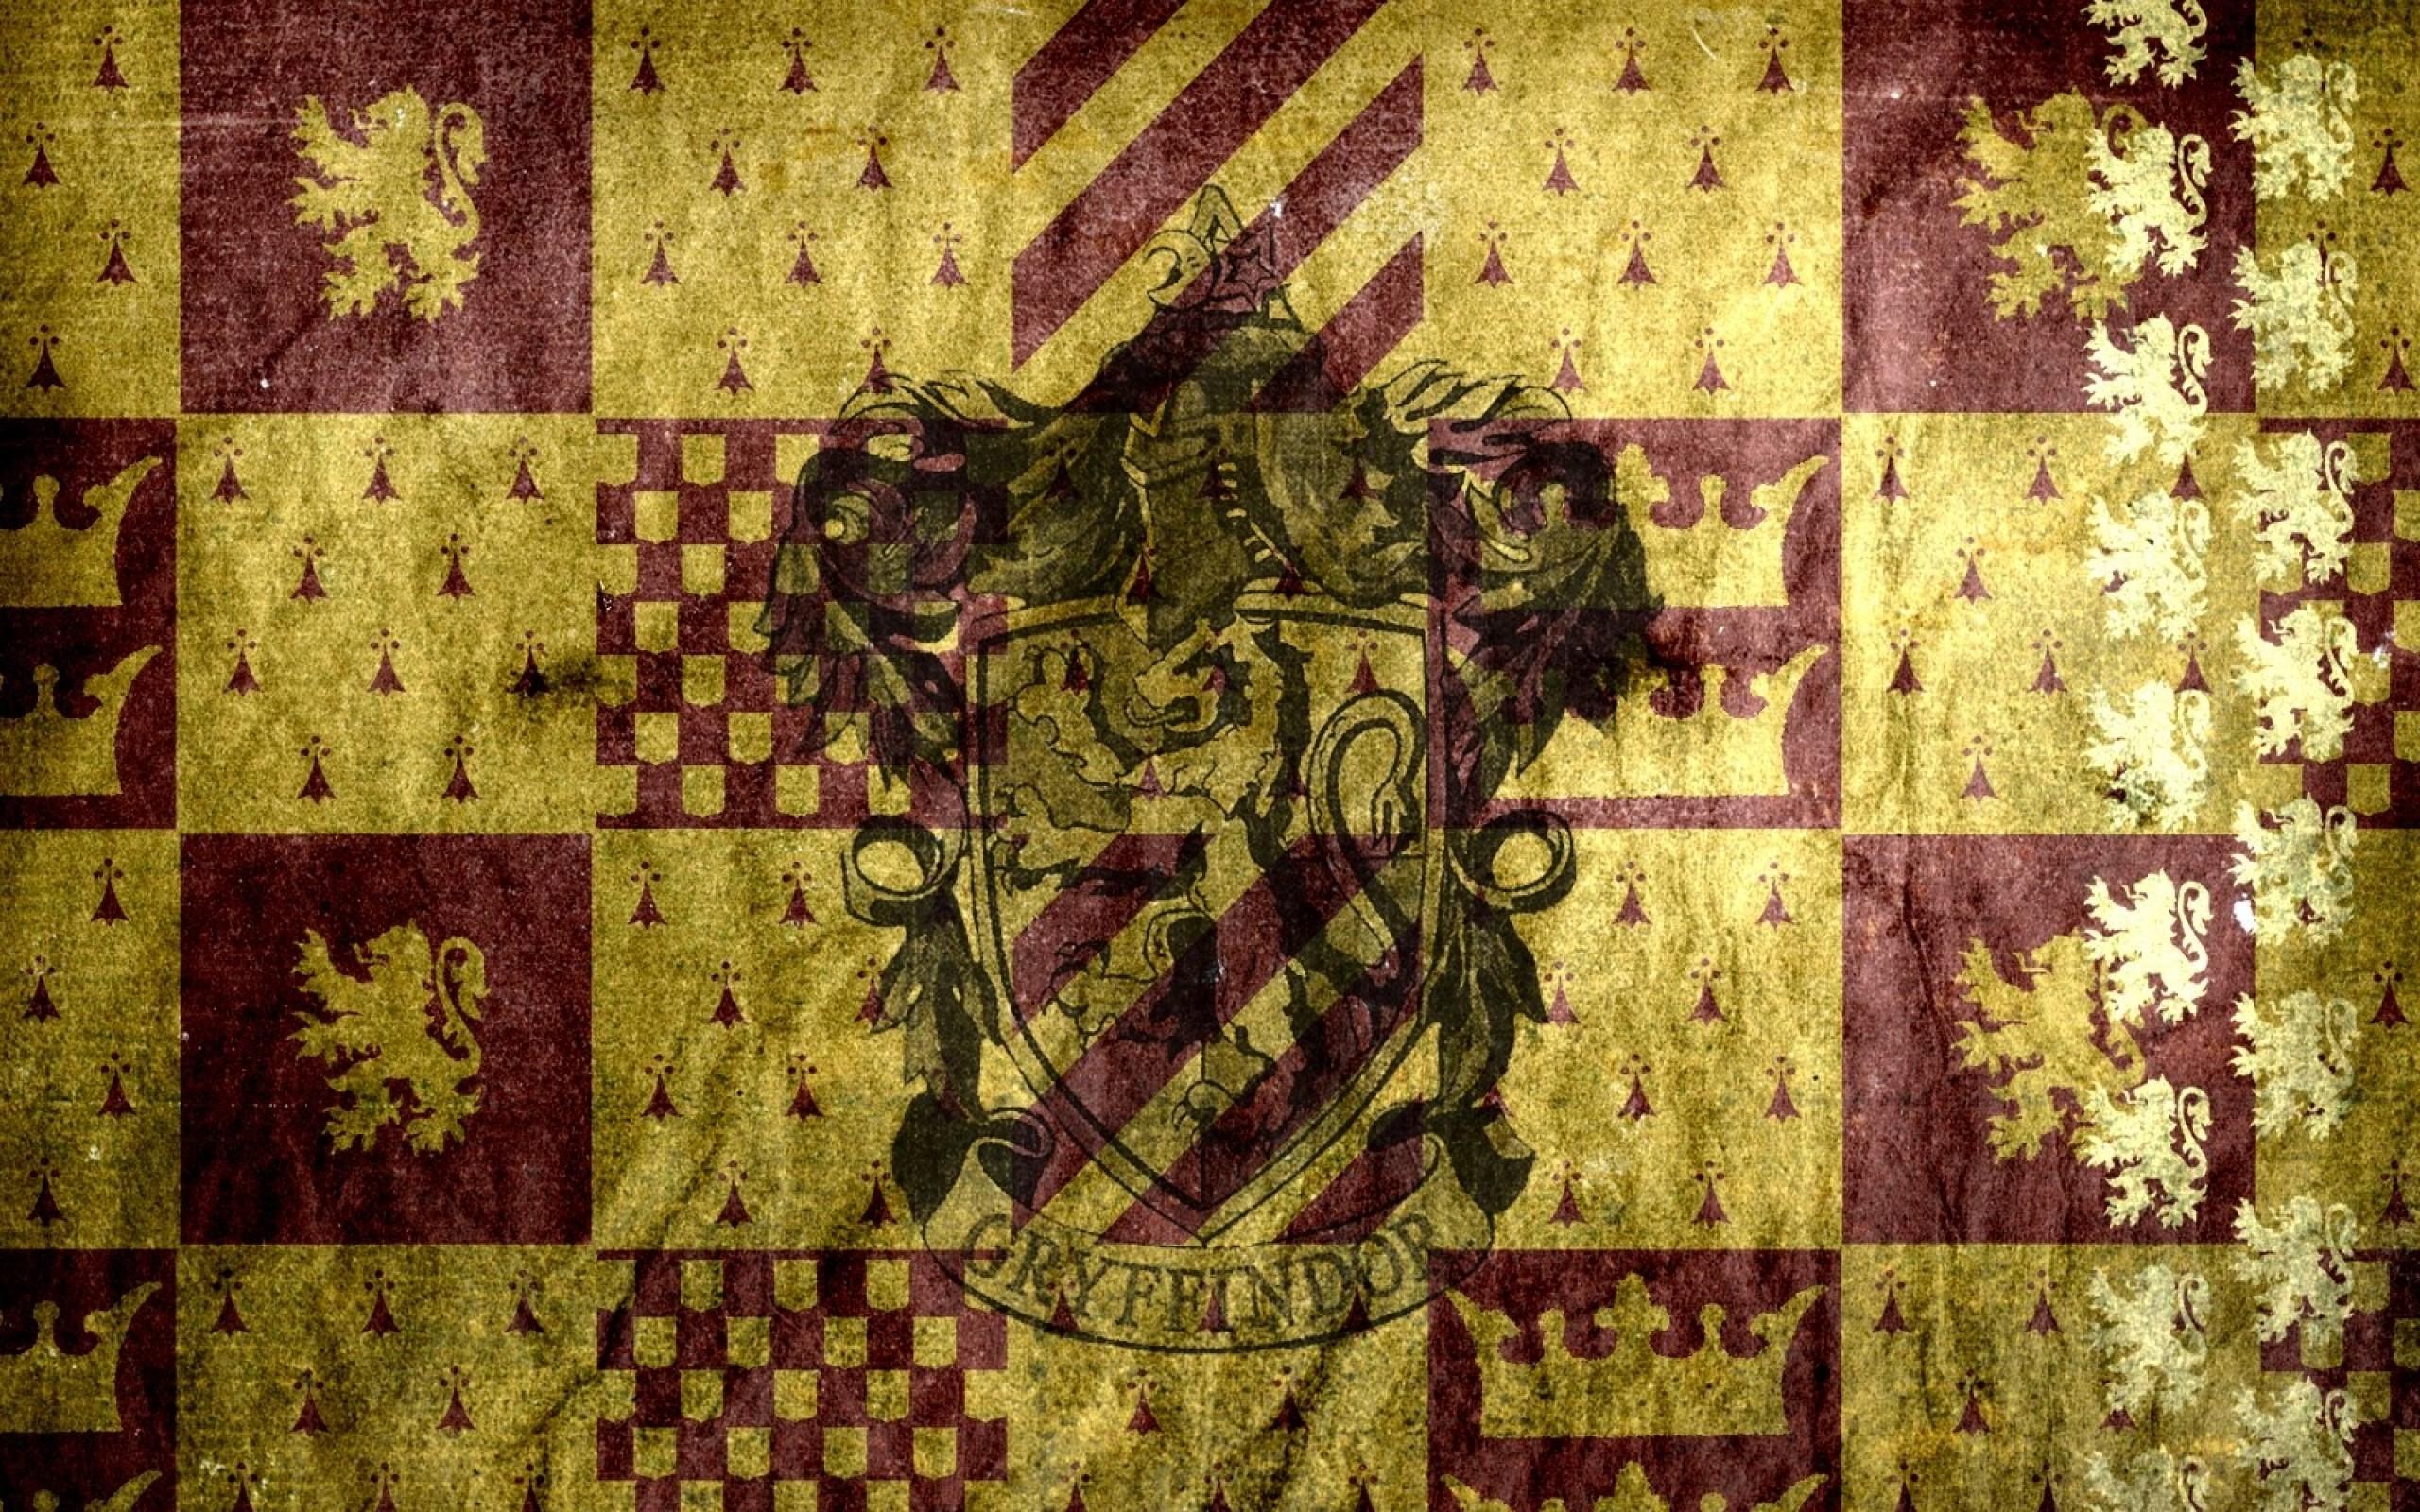 harry potter gryffindor hogwarts 1600×1089 wallpaper Art HD Wallpaper